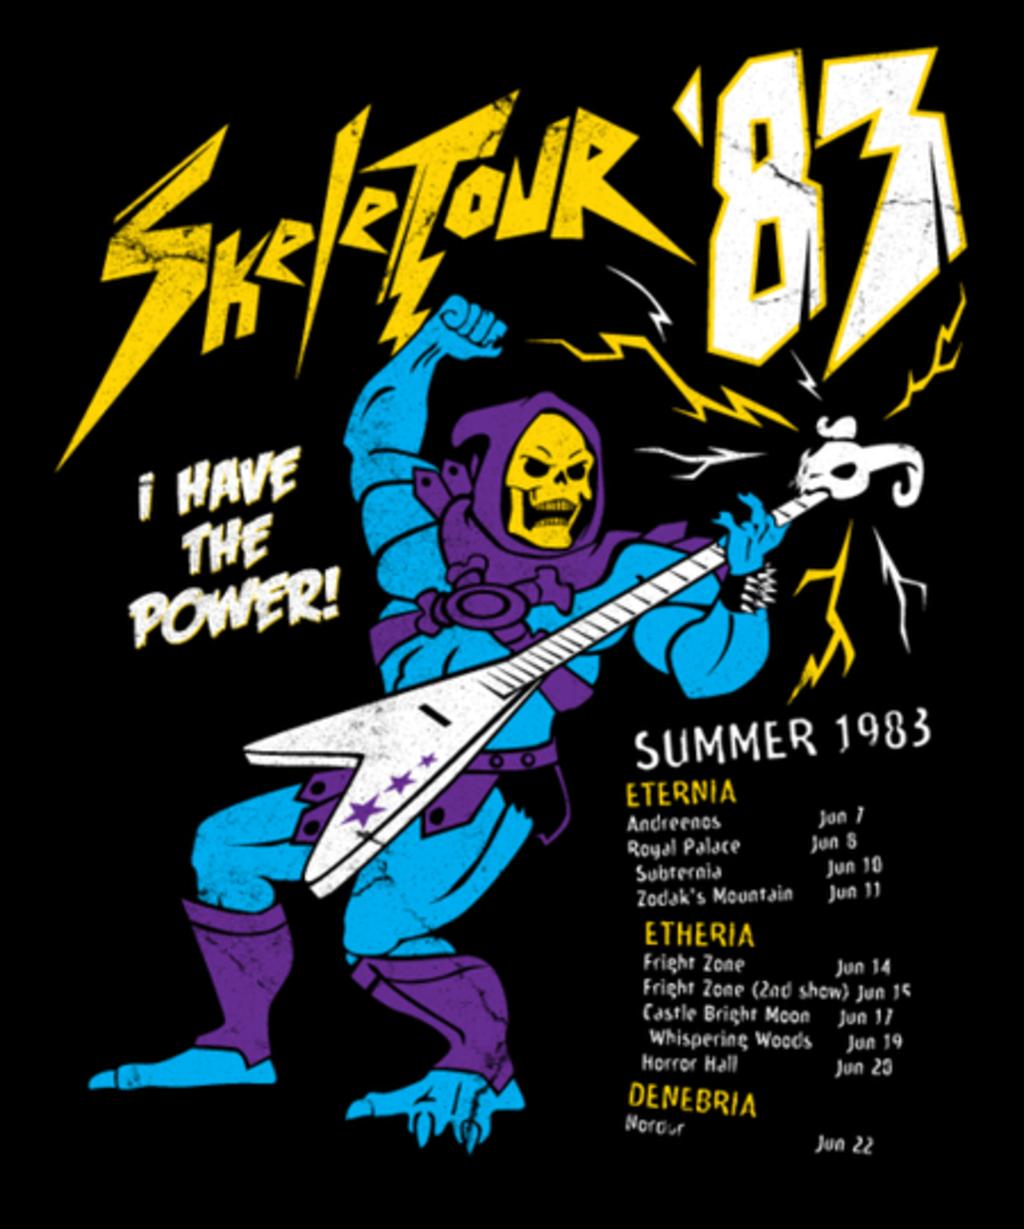 Qwertee: Skeletour '83